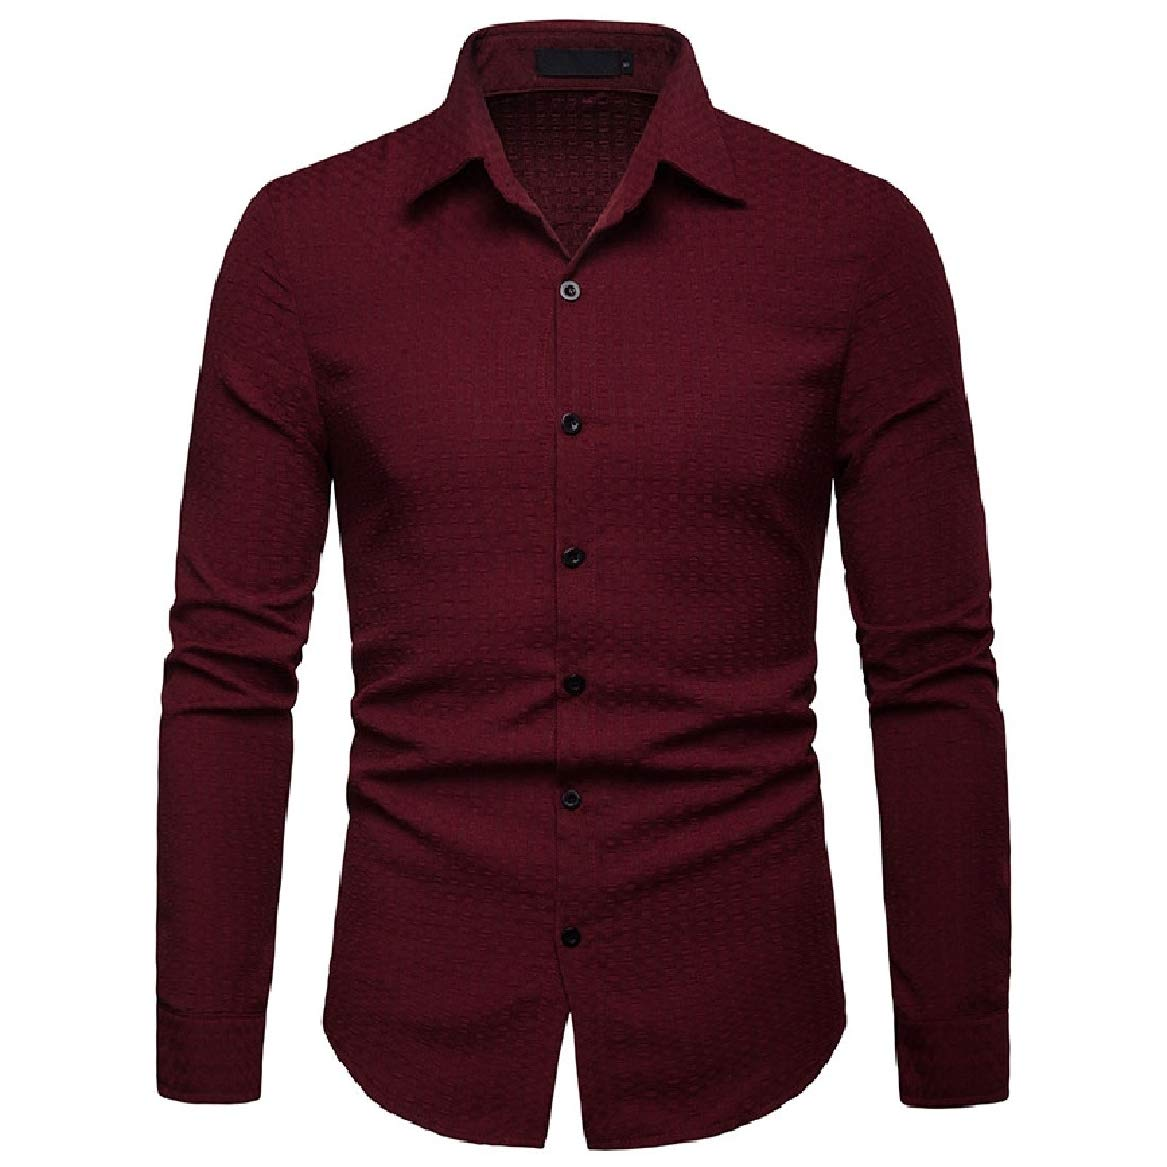 Sayah Mens Pure Color Trim-Fit Long Sleeve Lapel Collar Casual Dress Shirt